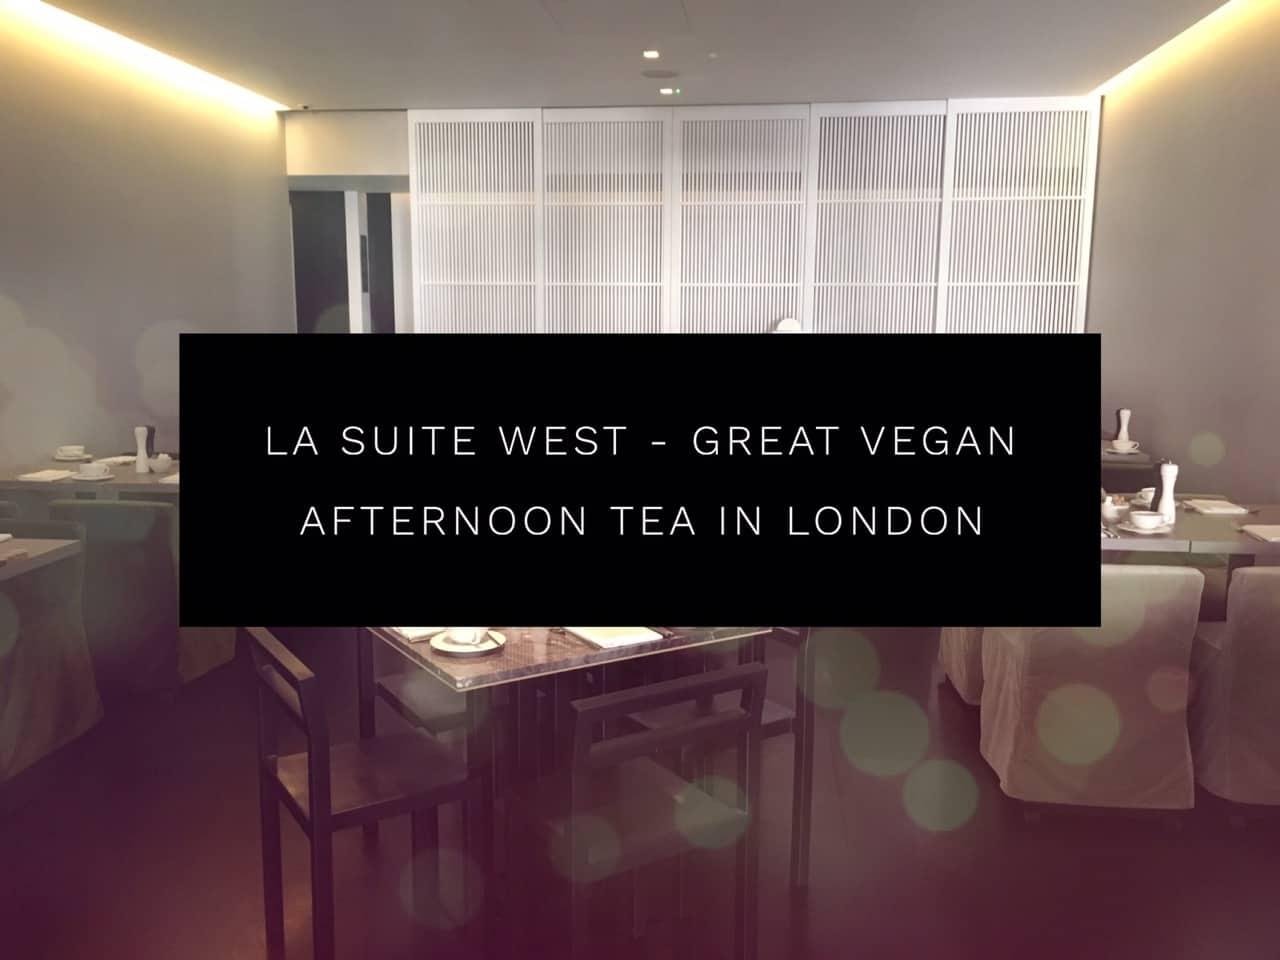 La Suite West Review - Great Vegan Afternoon Tea in London